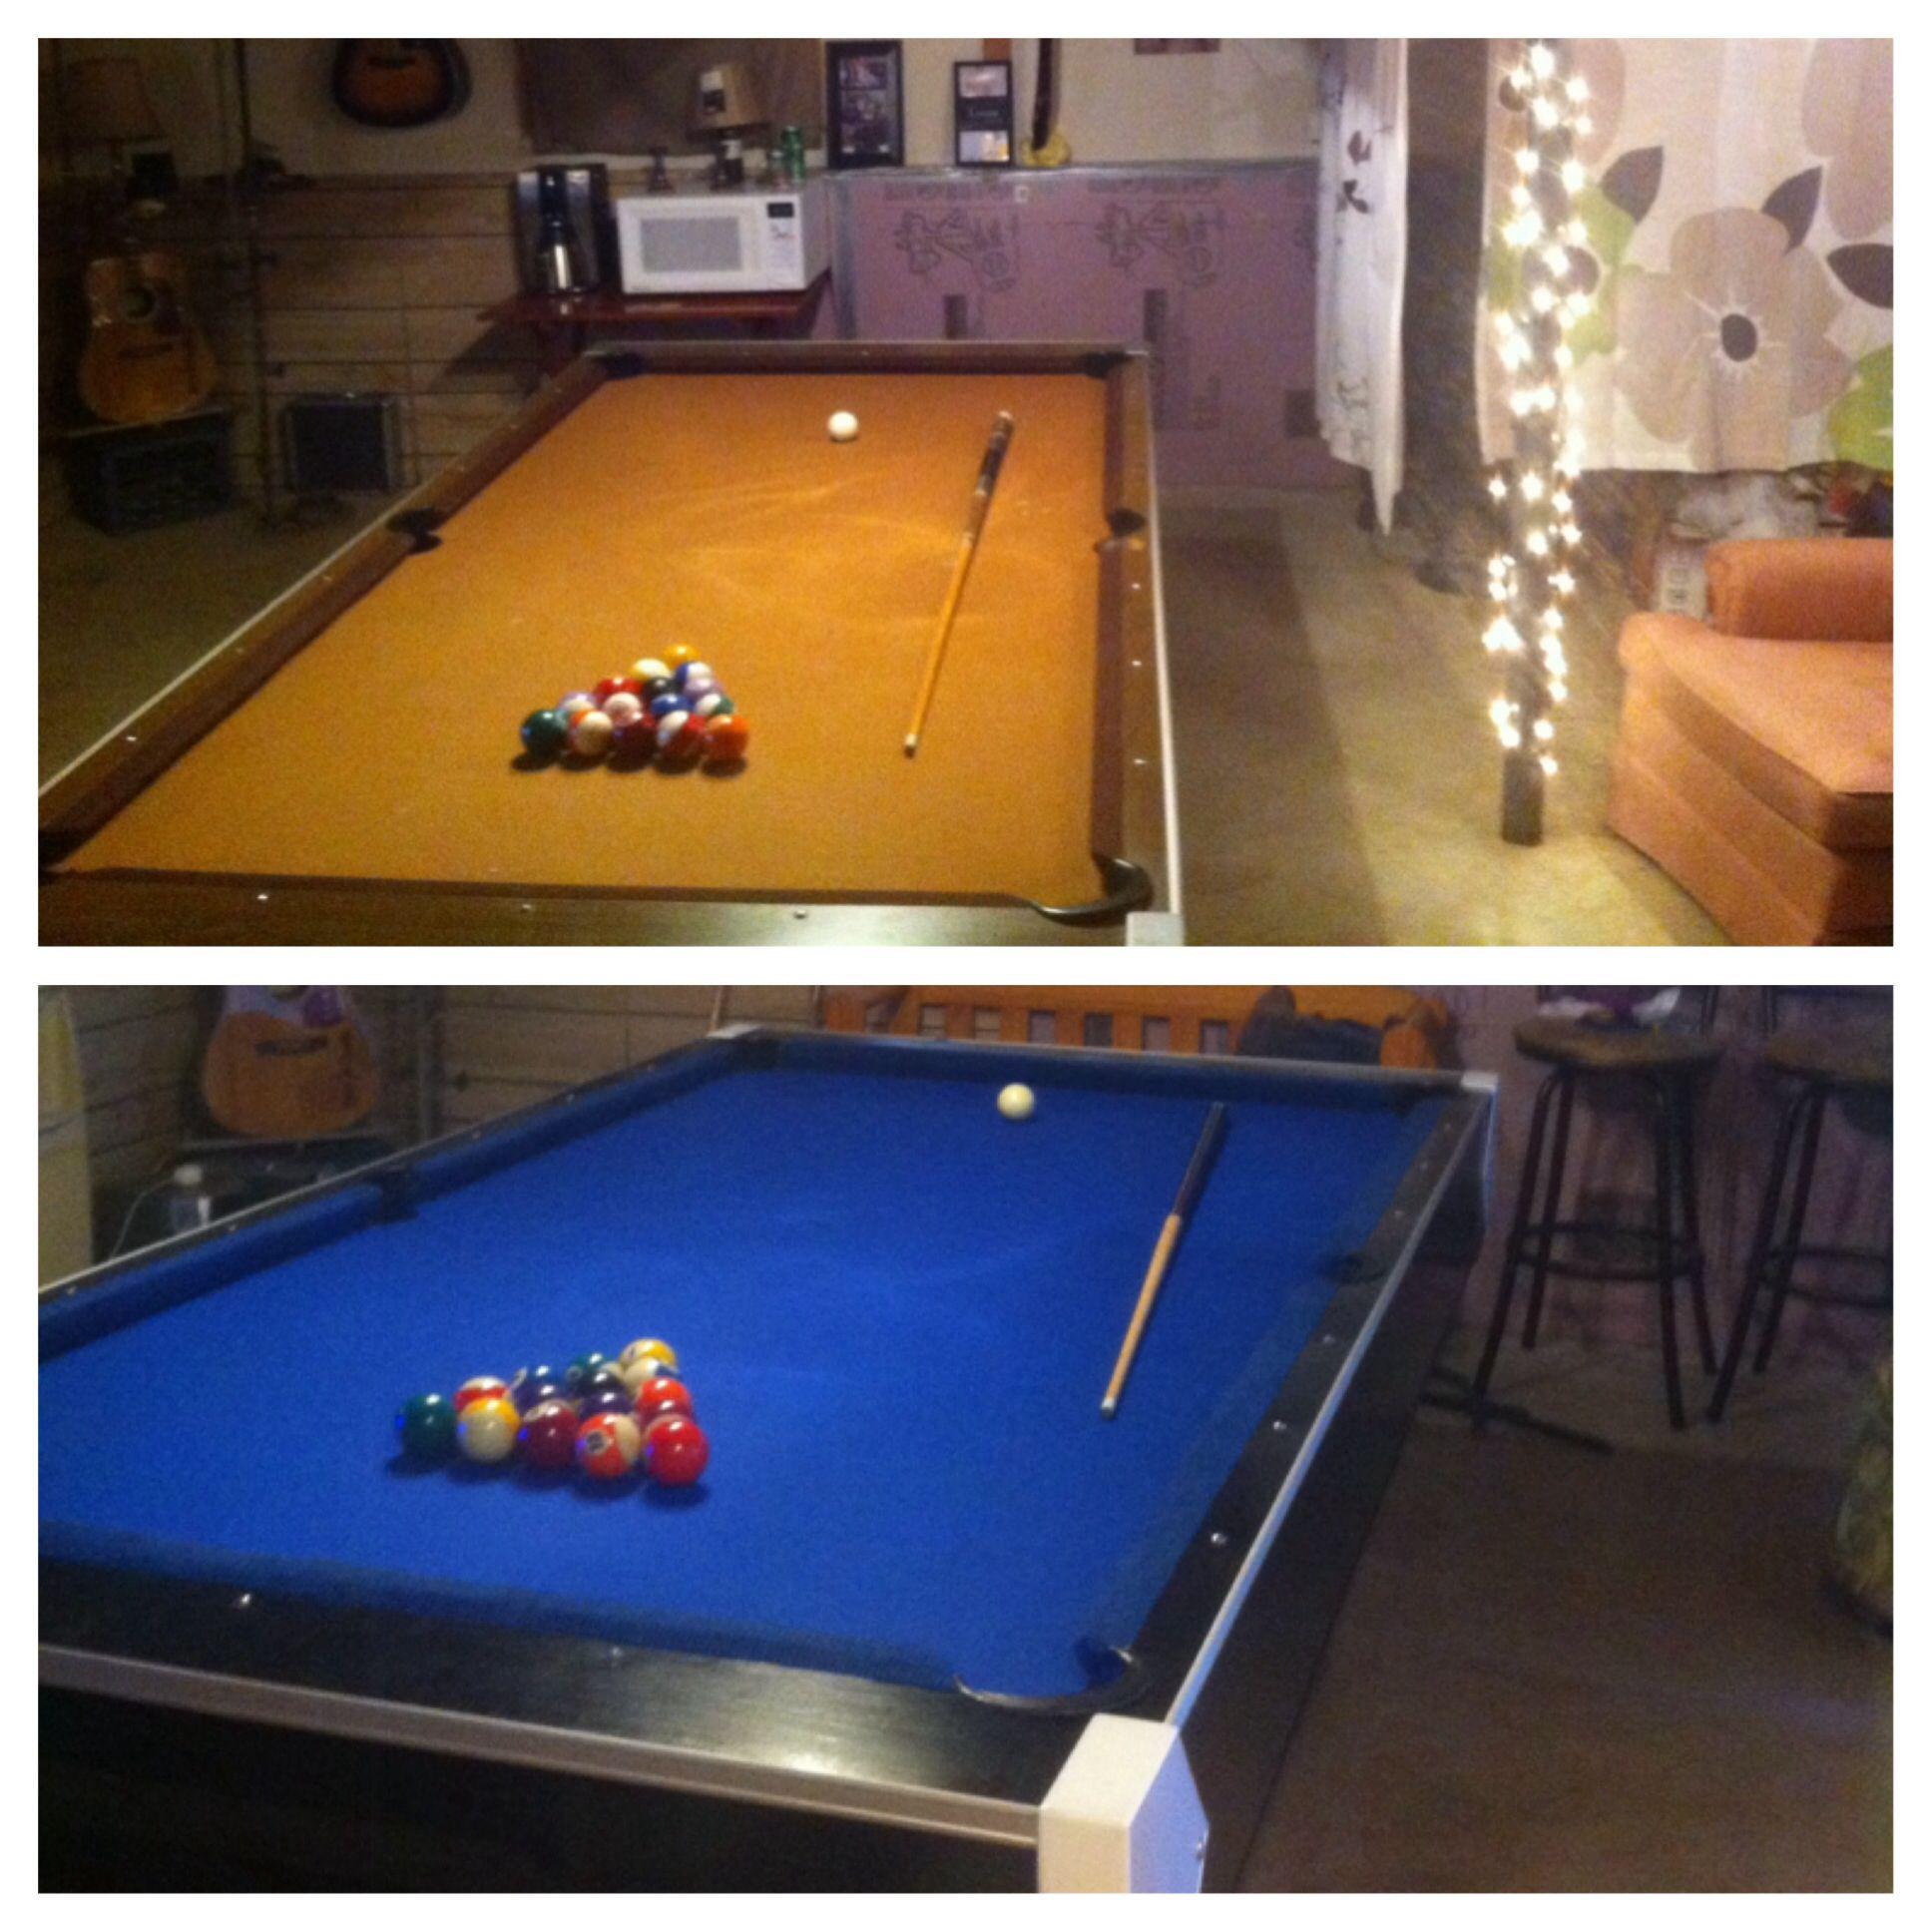 Diy Pool Table Remodel Used Pool Table 20 New Felt 80 New